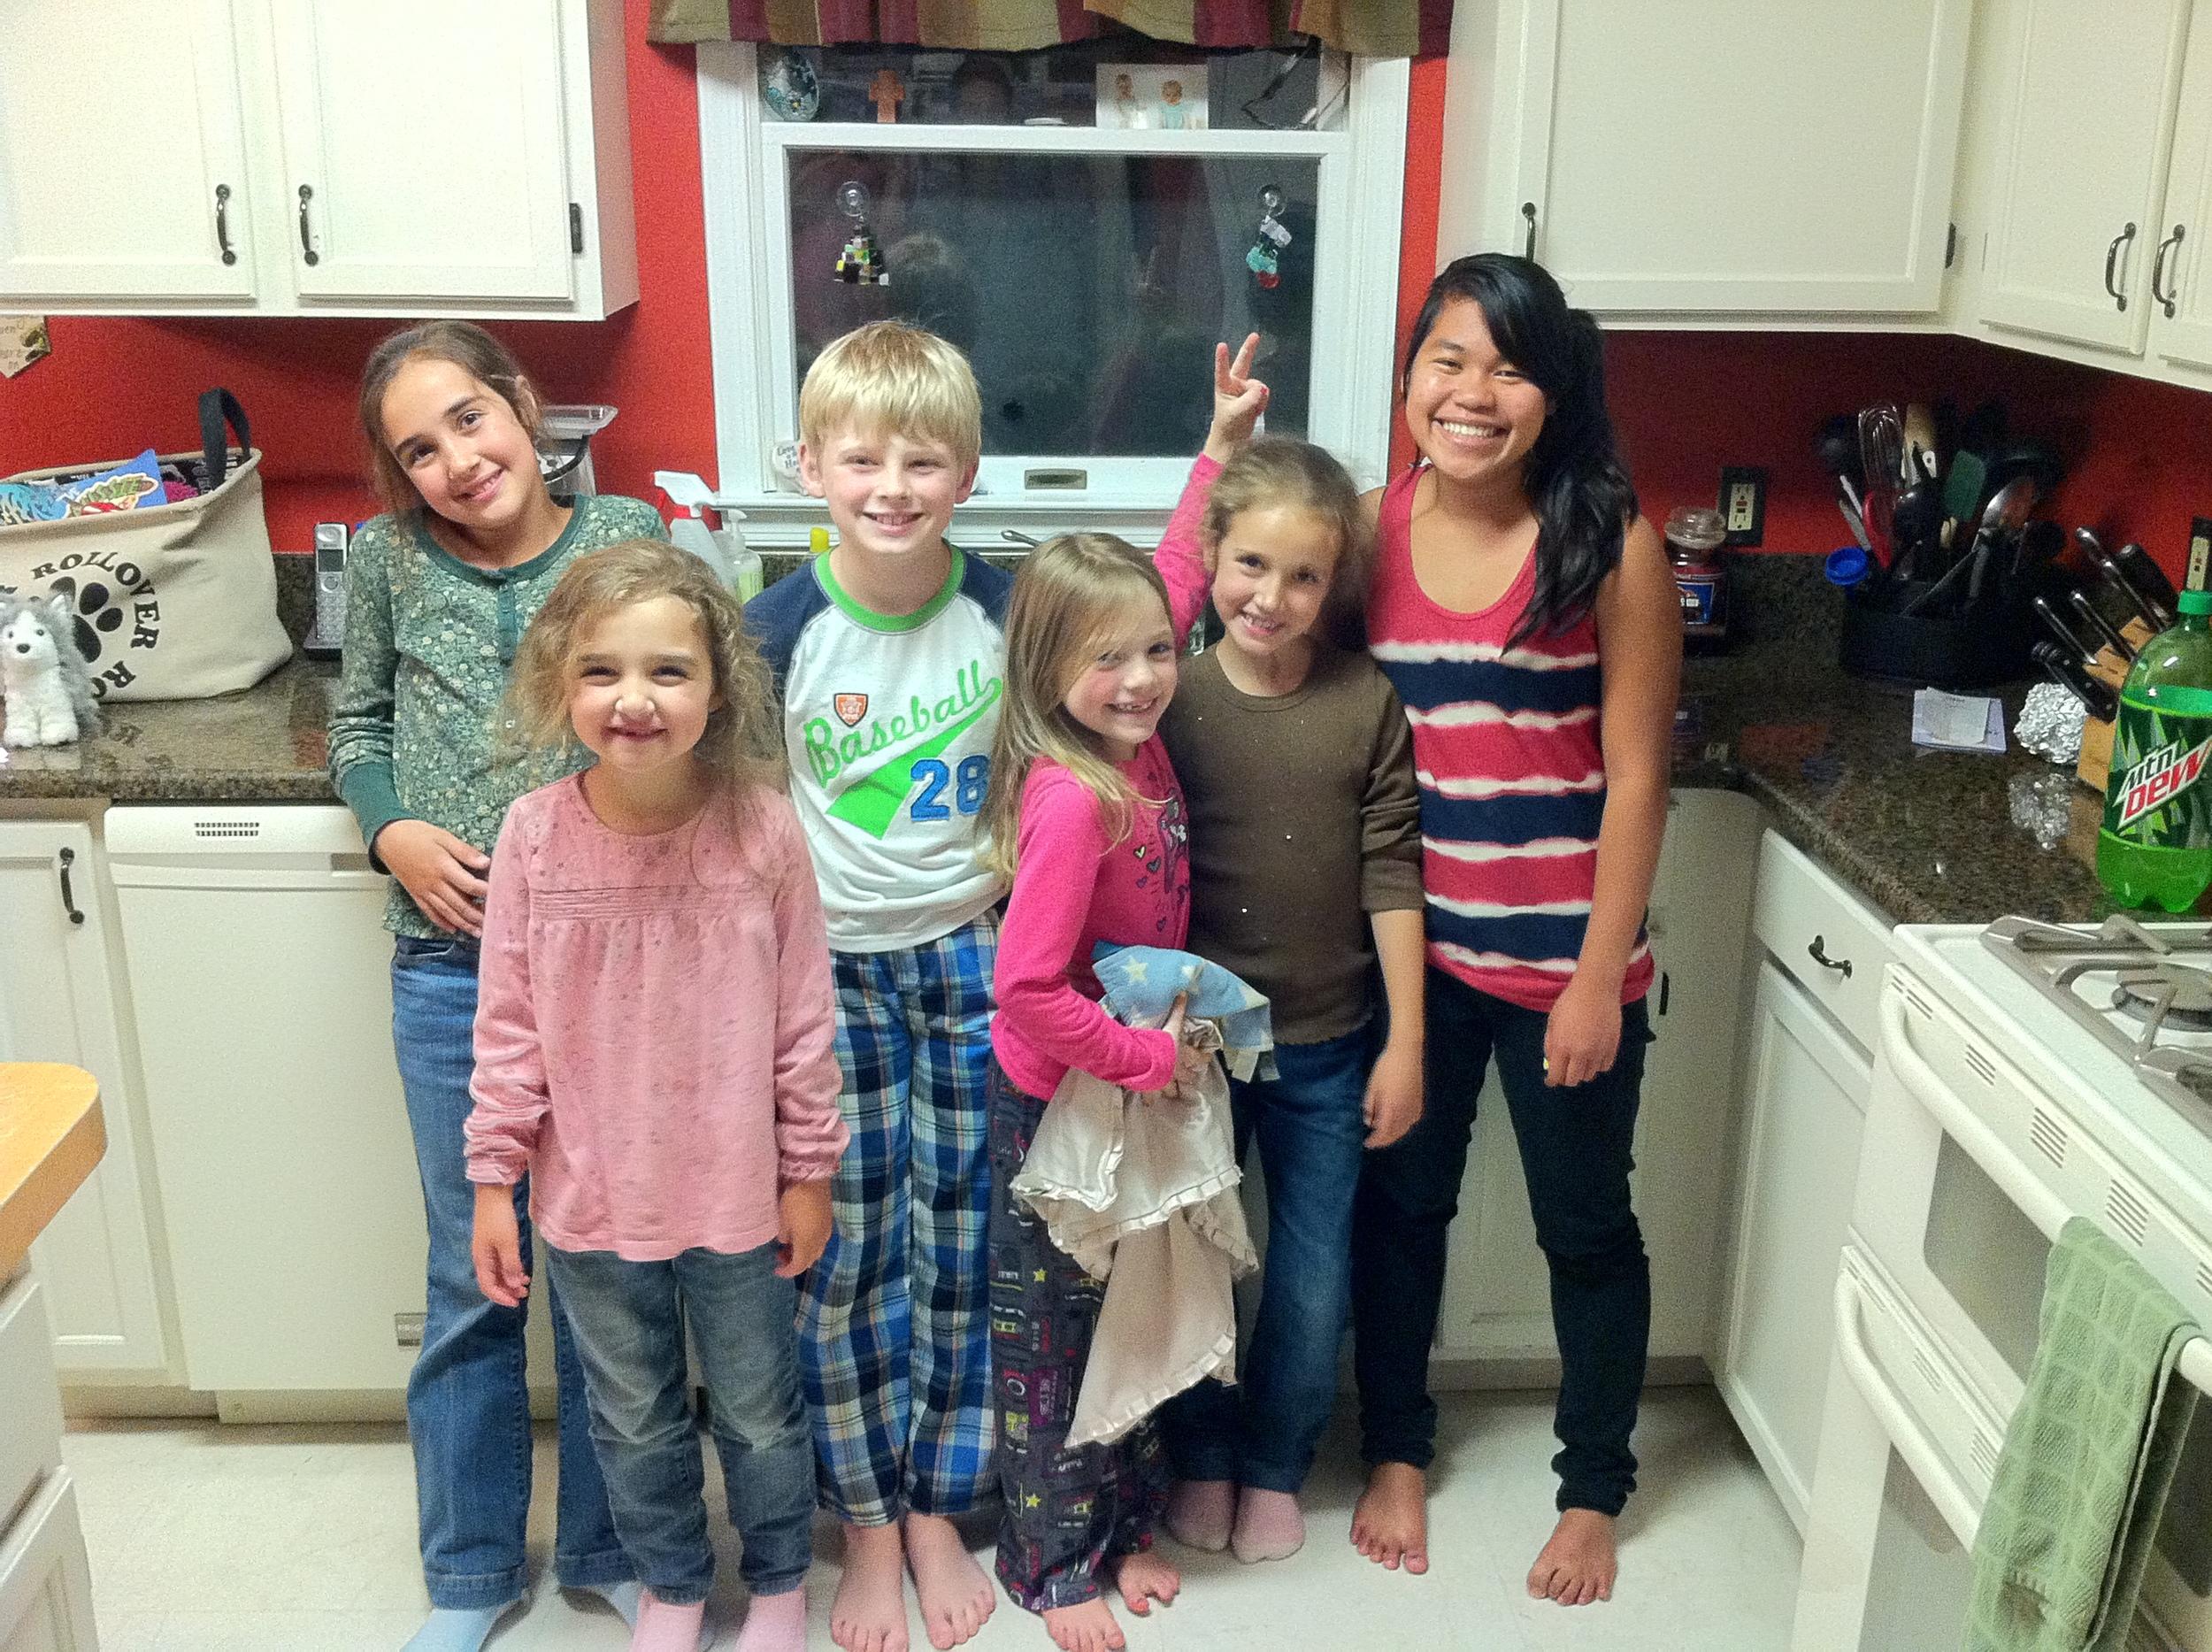 Singley kids and Oshman kids.